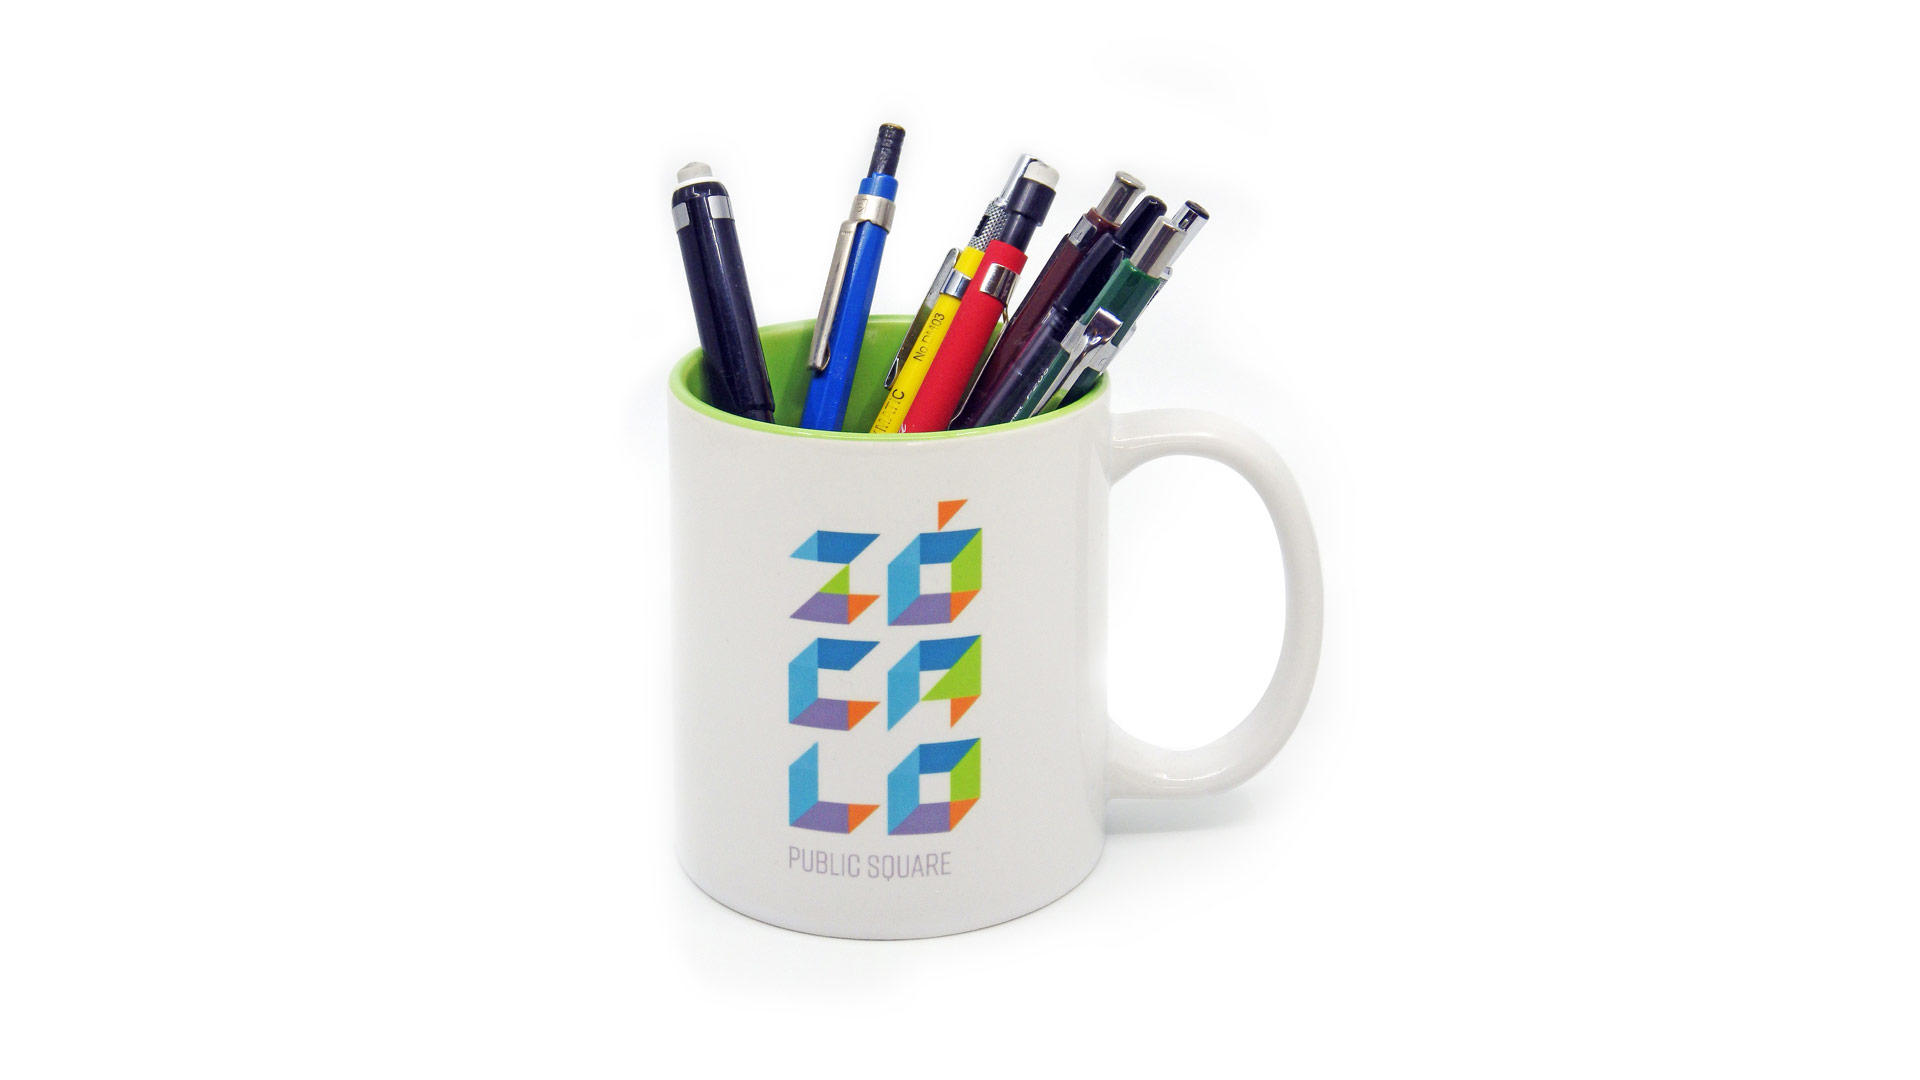 Zocalo-Mug@2x.jpg